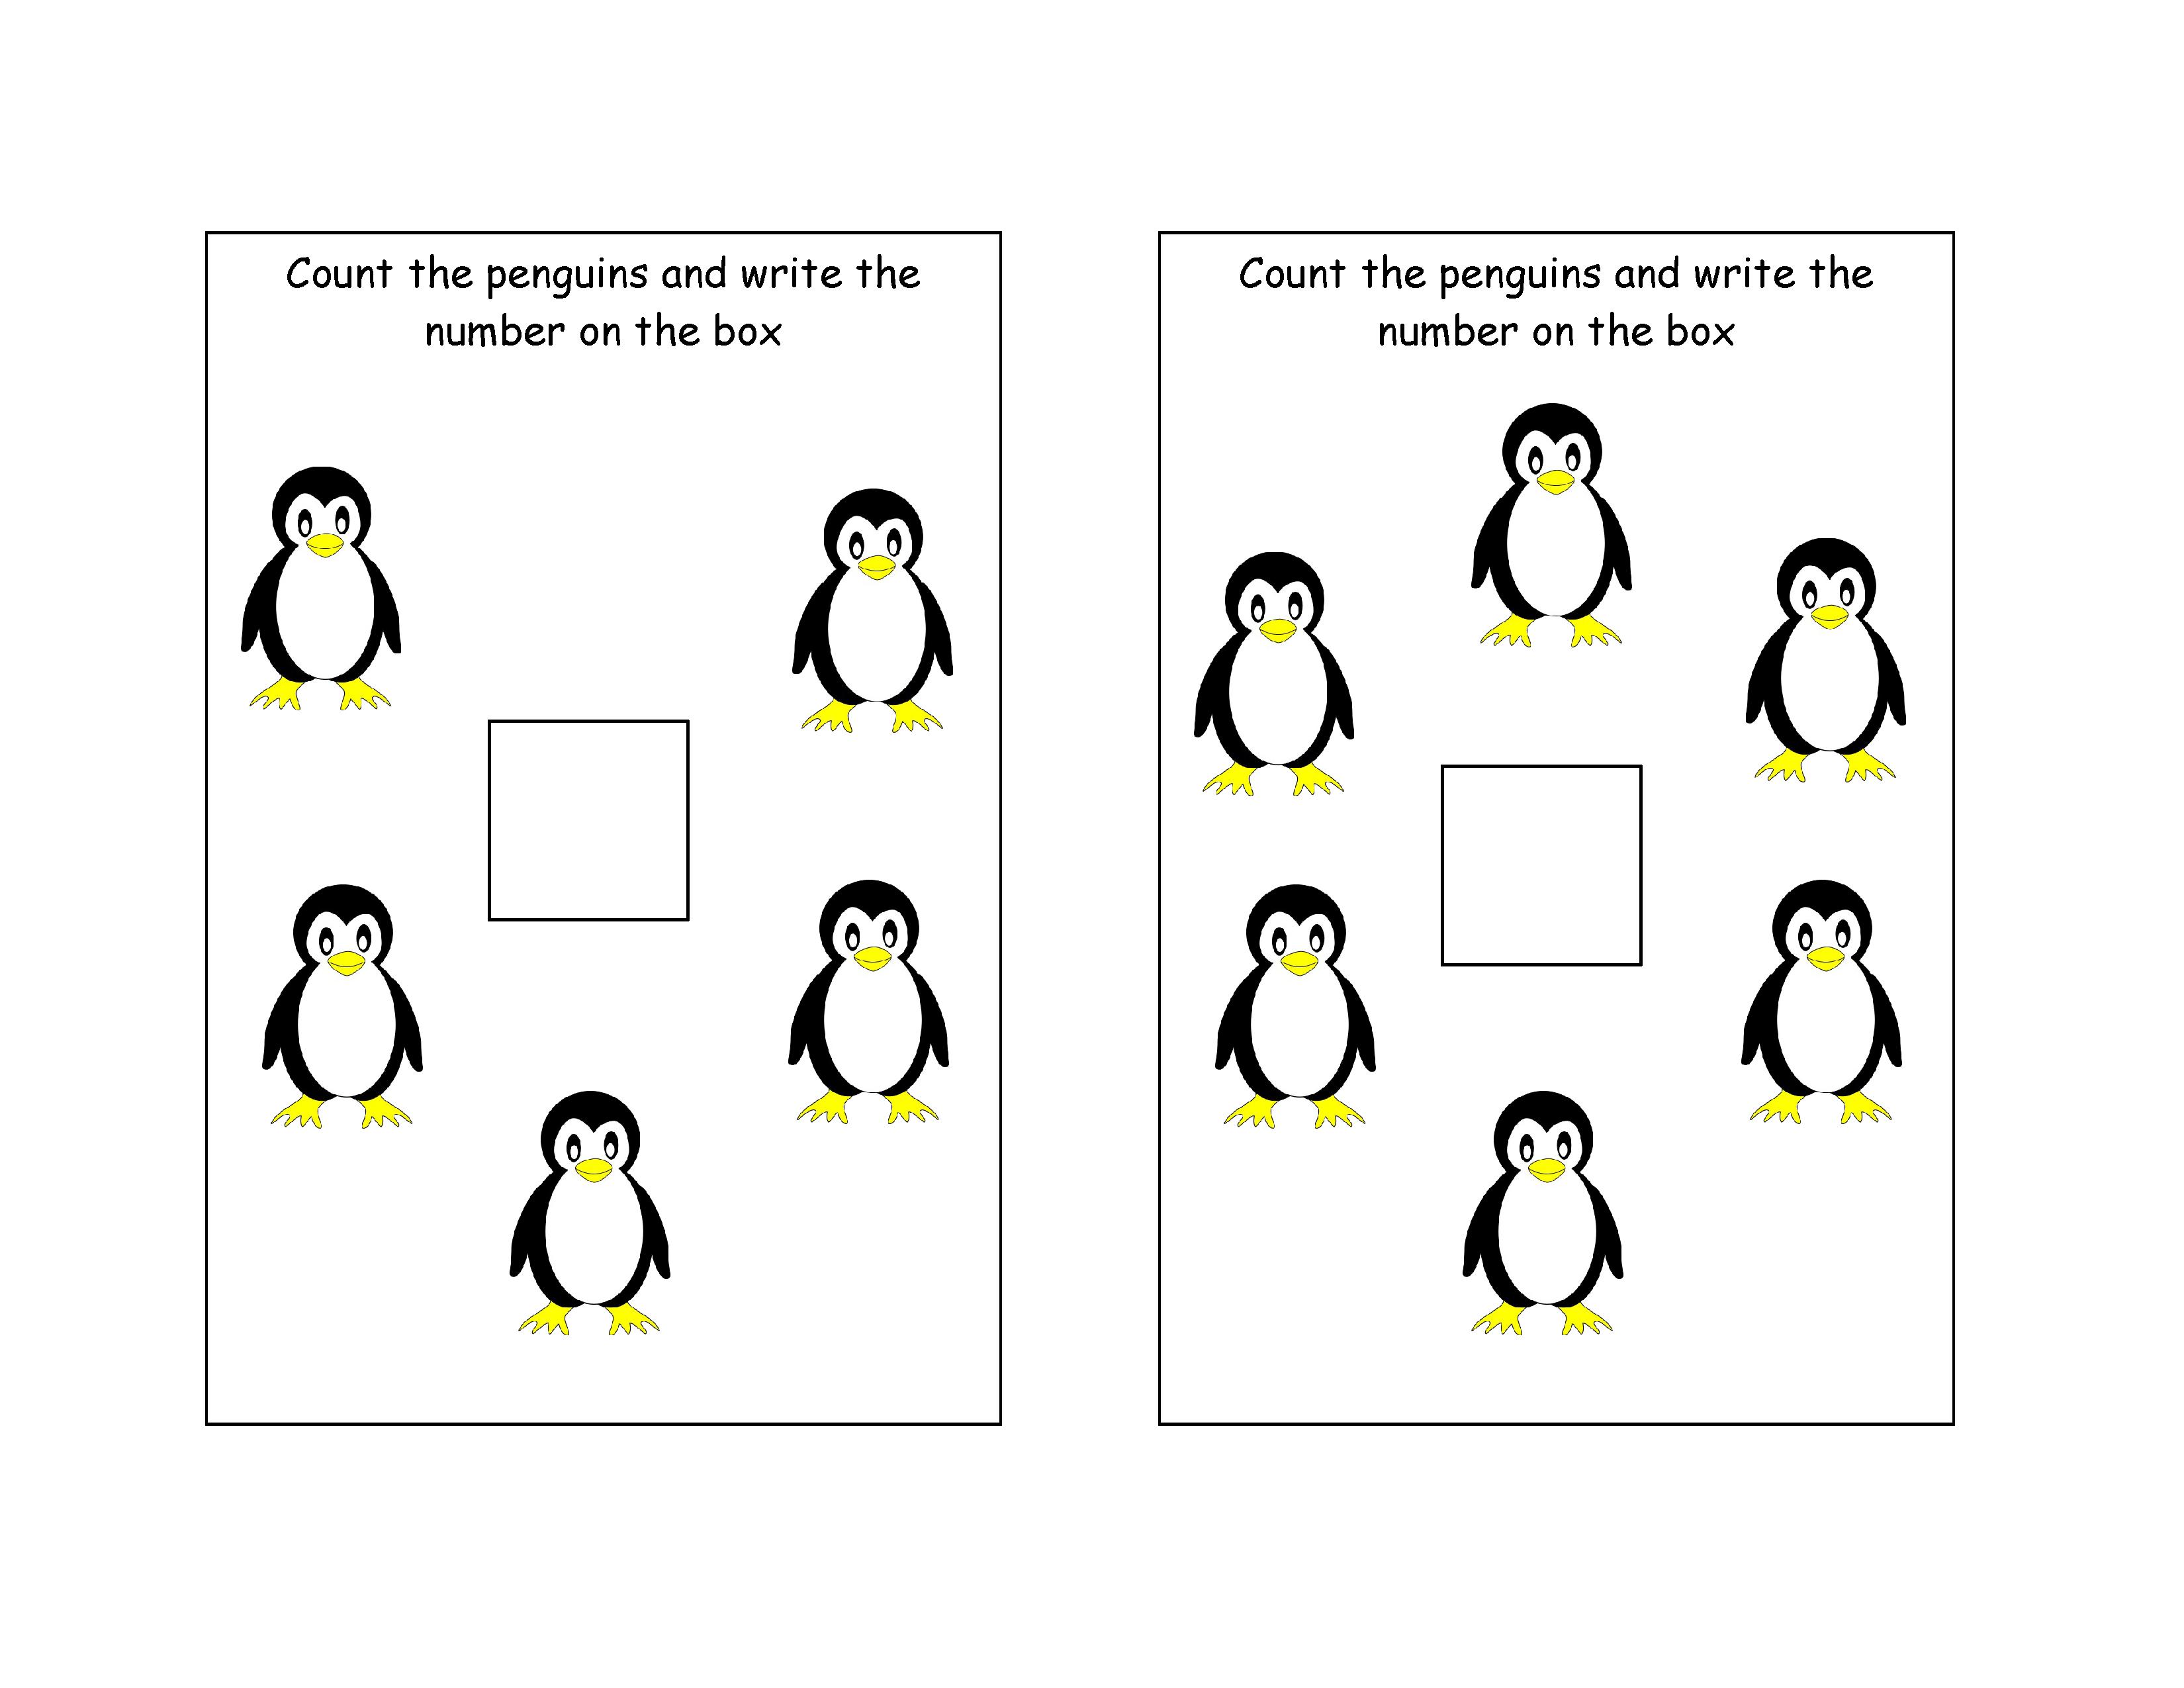 Free Printable - Counting Penguins Mini Worksheet | Free Printable - Free Printable Penguin Books